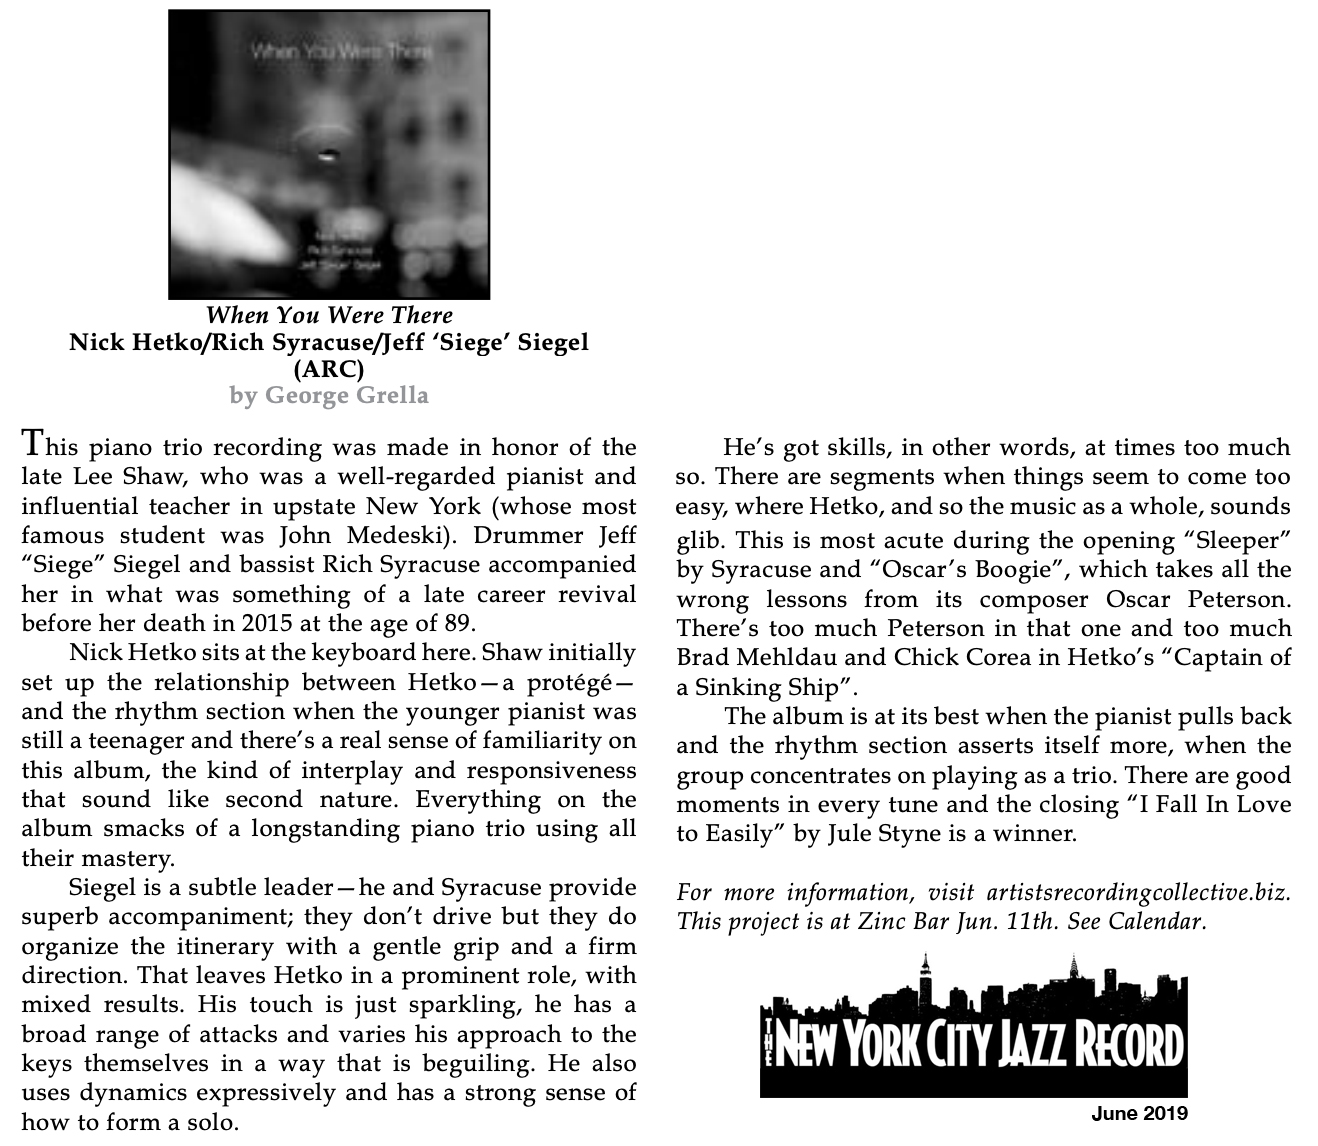 REVIEW: New York City Jazz Record Reviews Jeff Siegel's